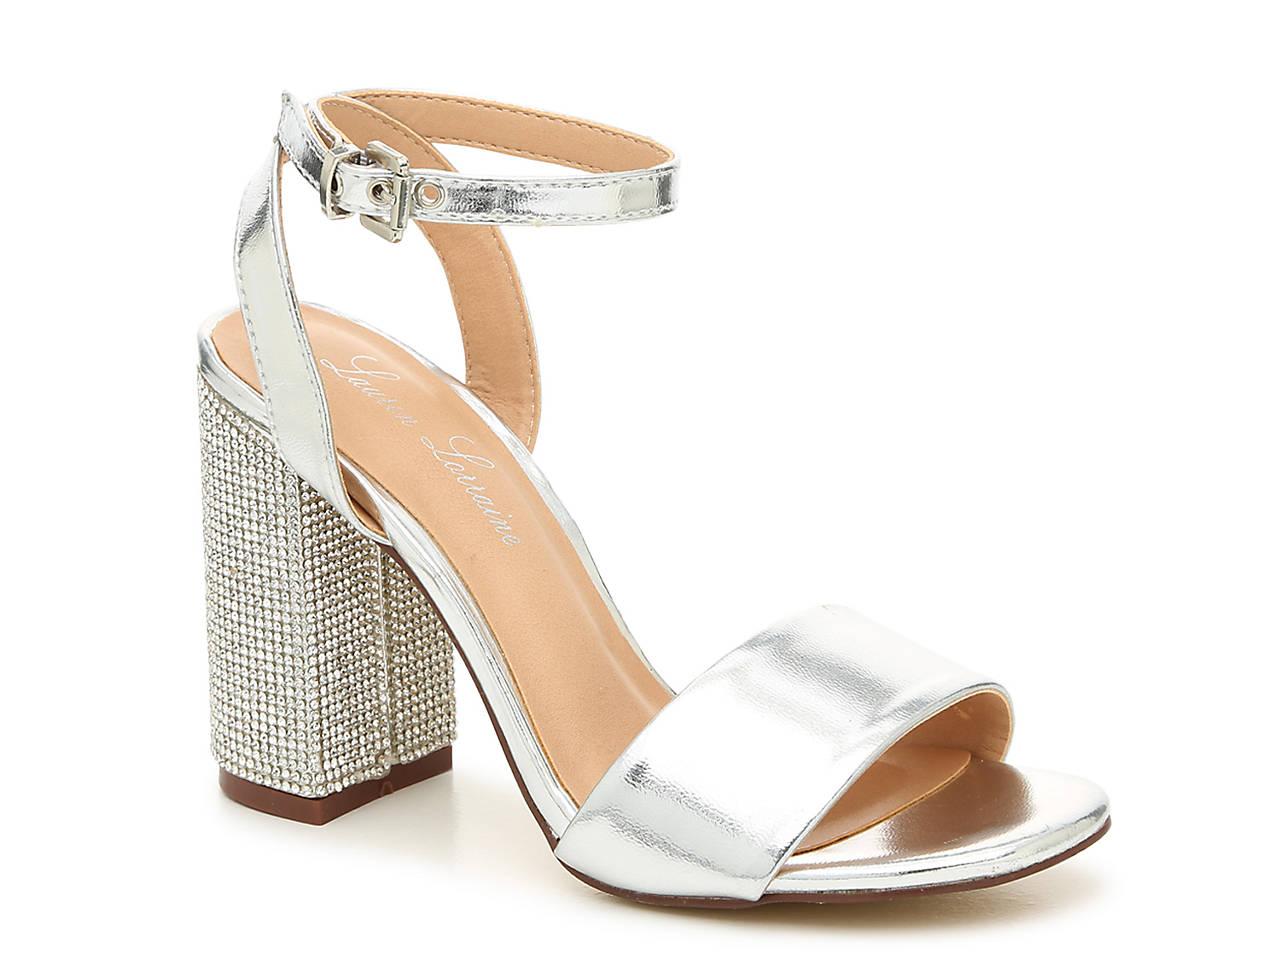 950e44d9ecf Lauren Lorraine Julia Sandal Women s Shoes